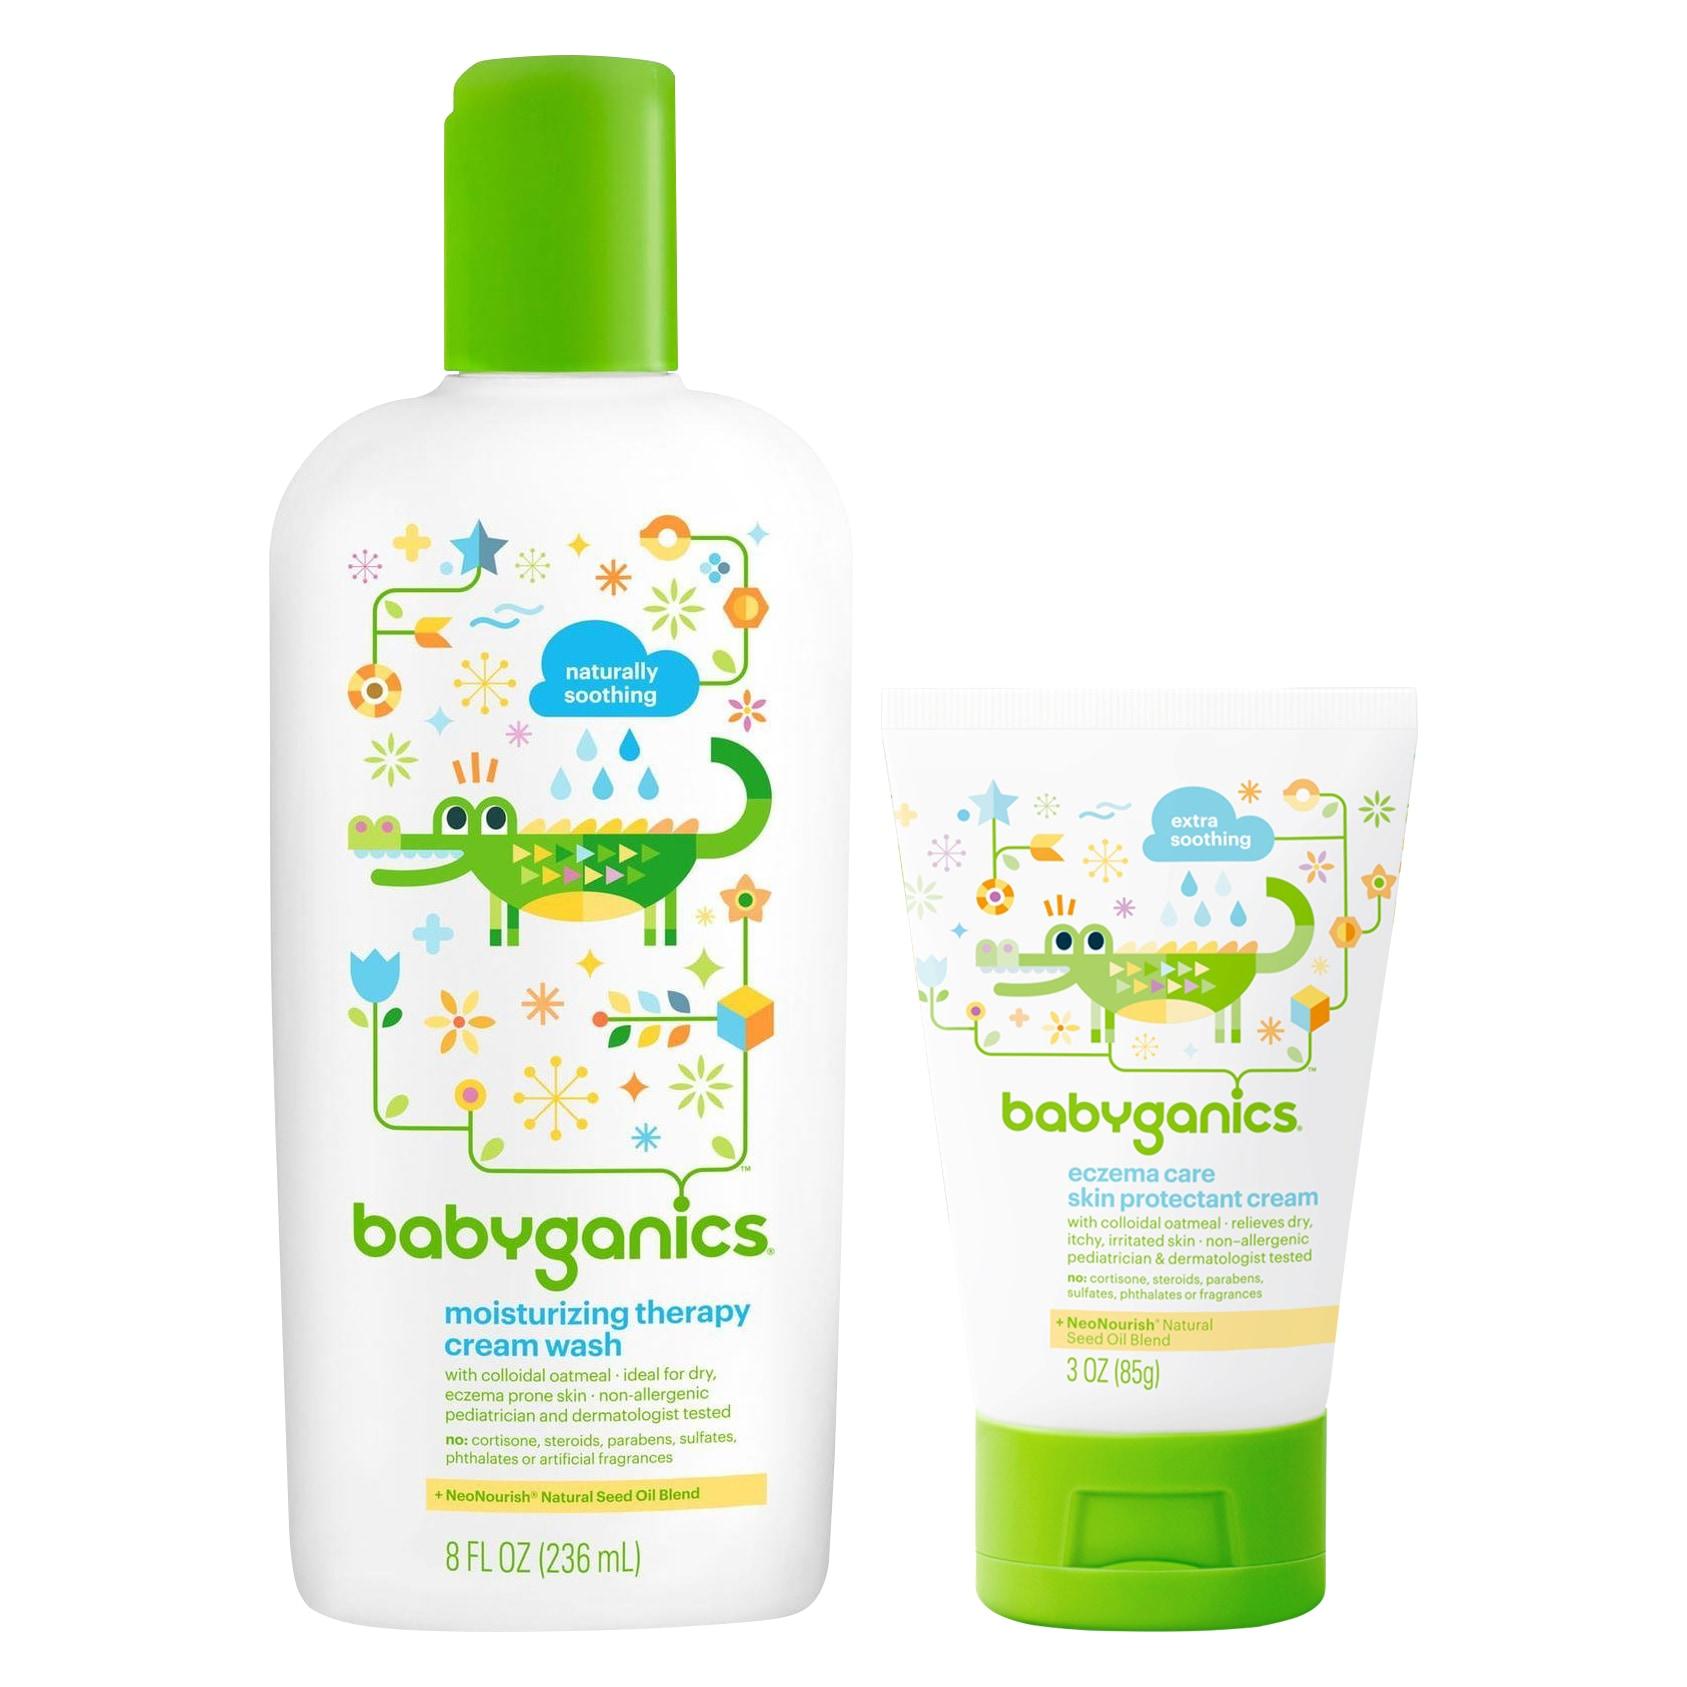 BabyGanics Moisturizing Therapy Cream Wash with Eczema Cr...